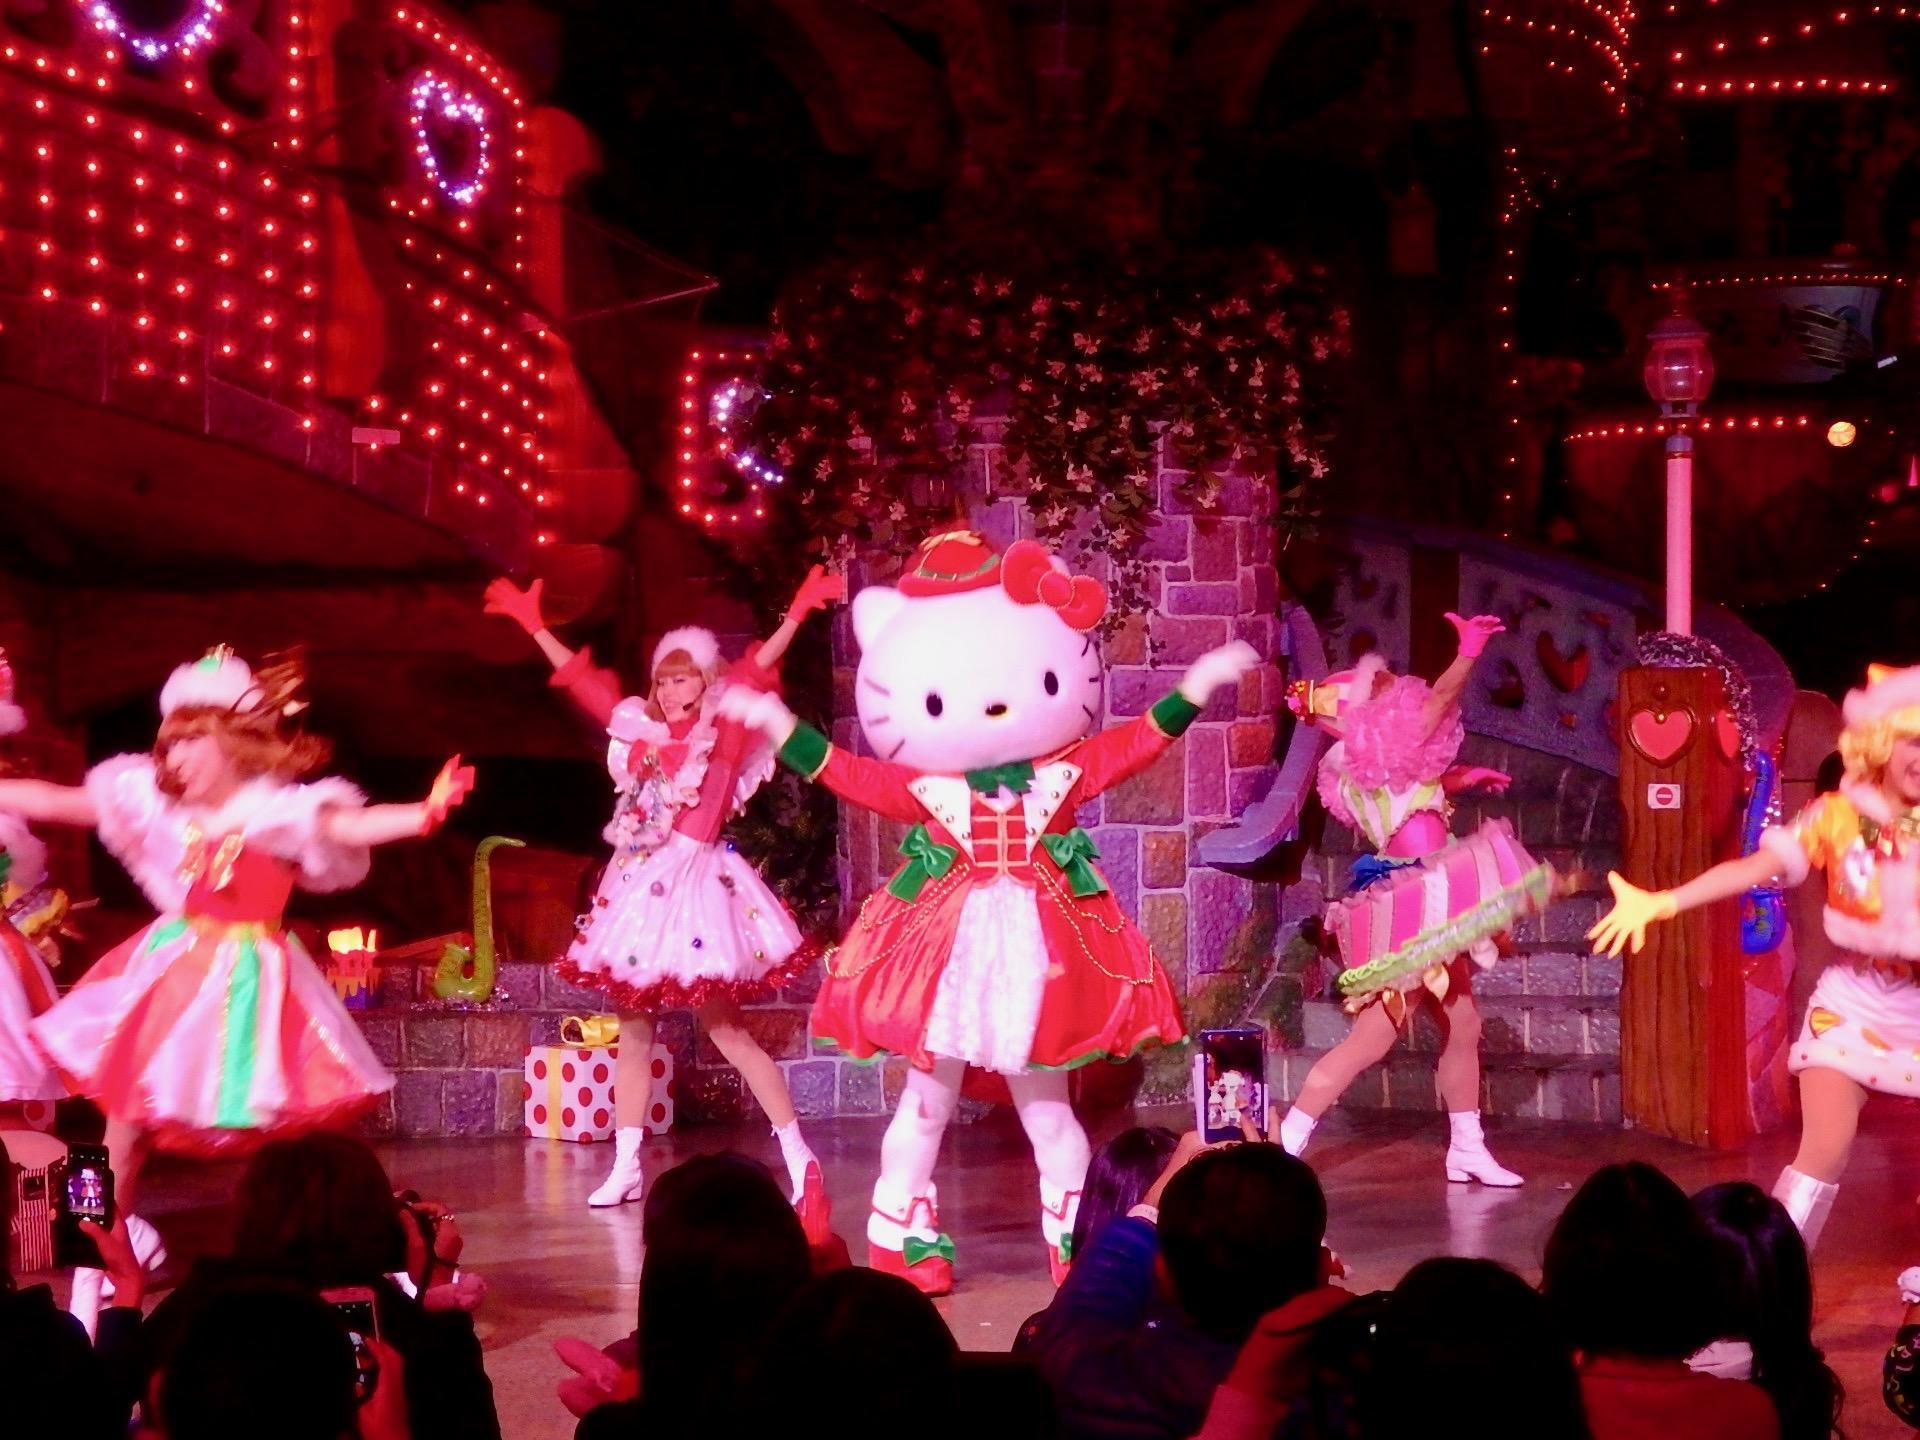 http://news.yoshimoto.co.jp/20171110002508-21d012b35fc4cf7fb66ff1e8ff5cae39ac8e1346.jpg